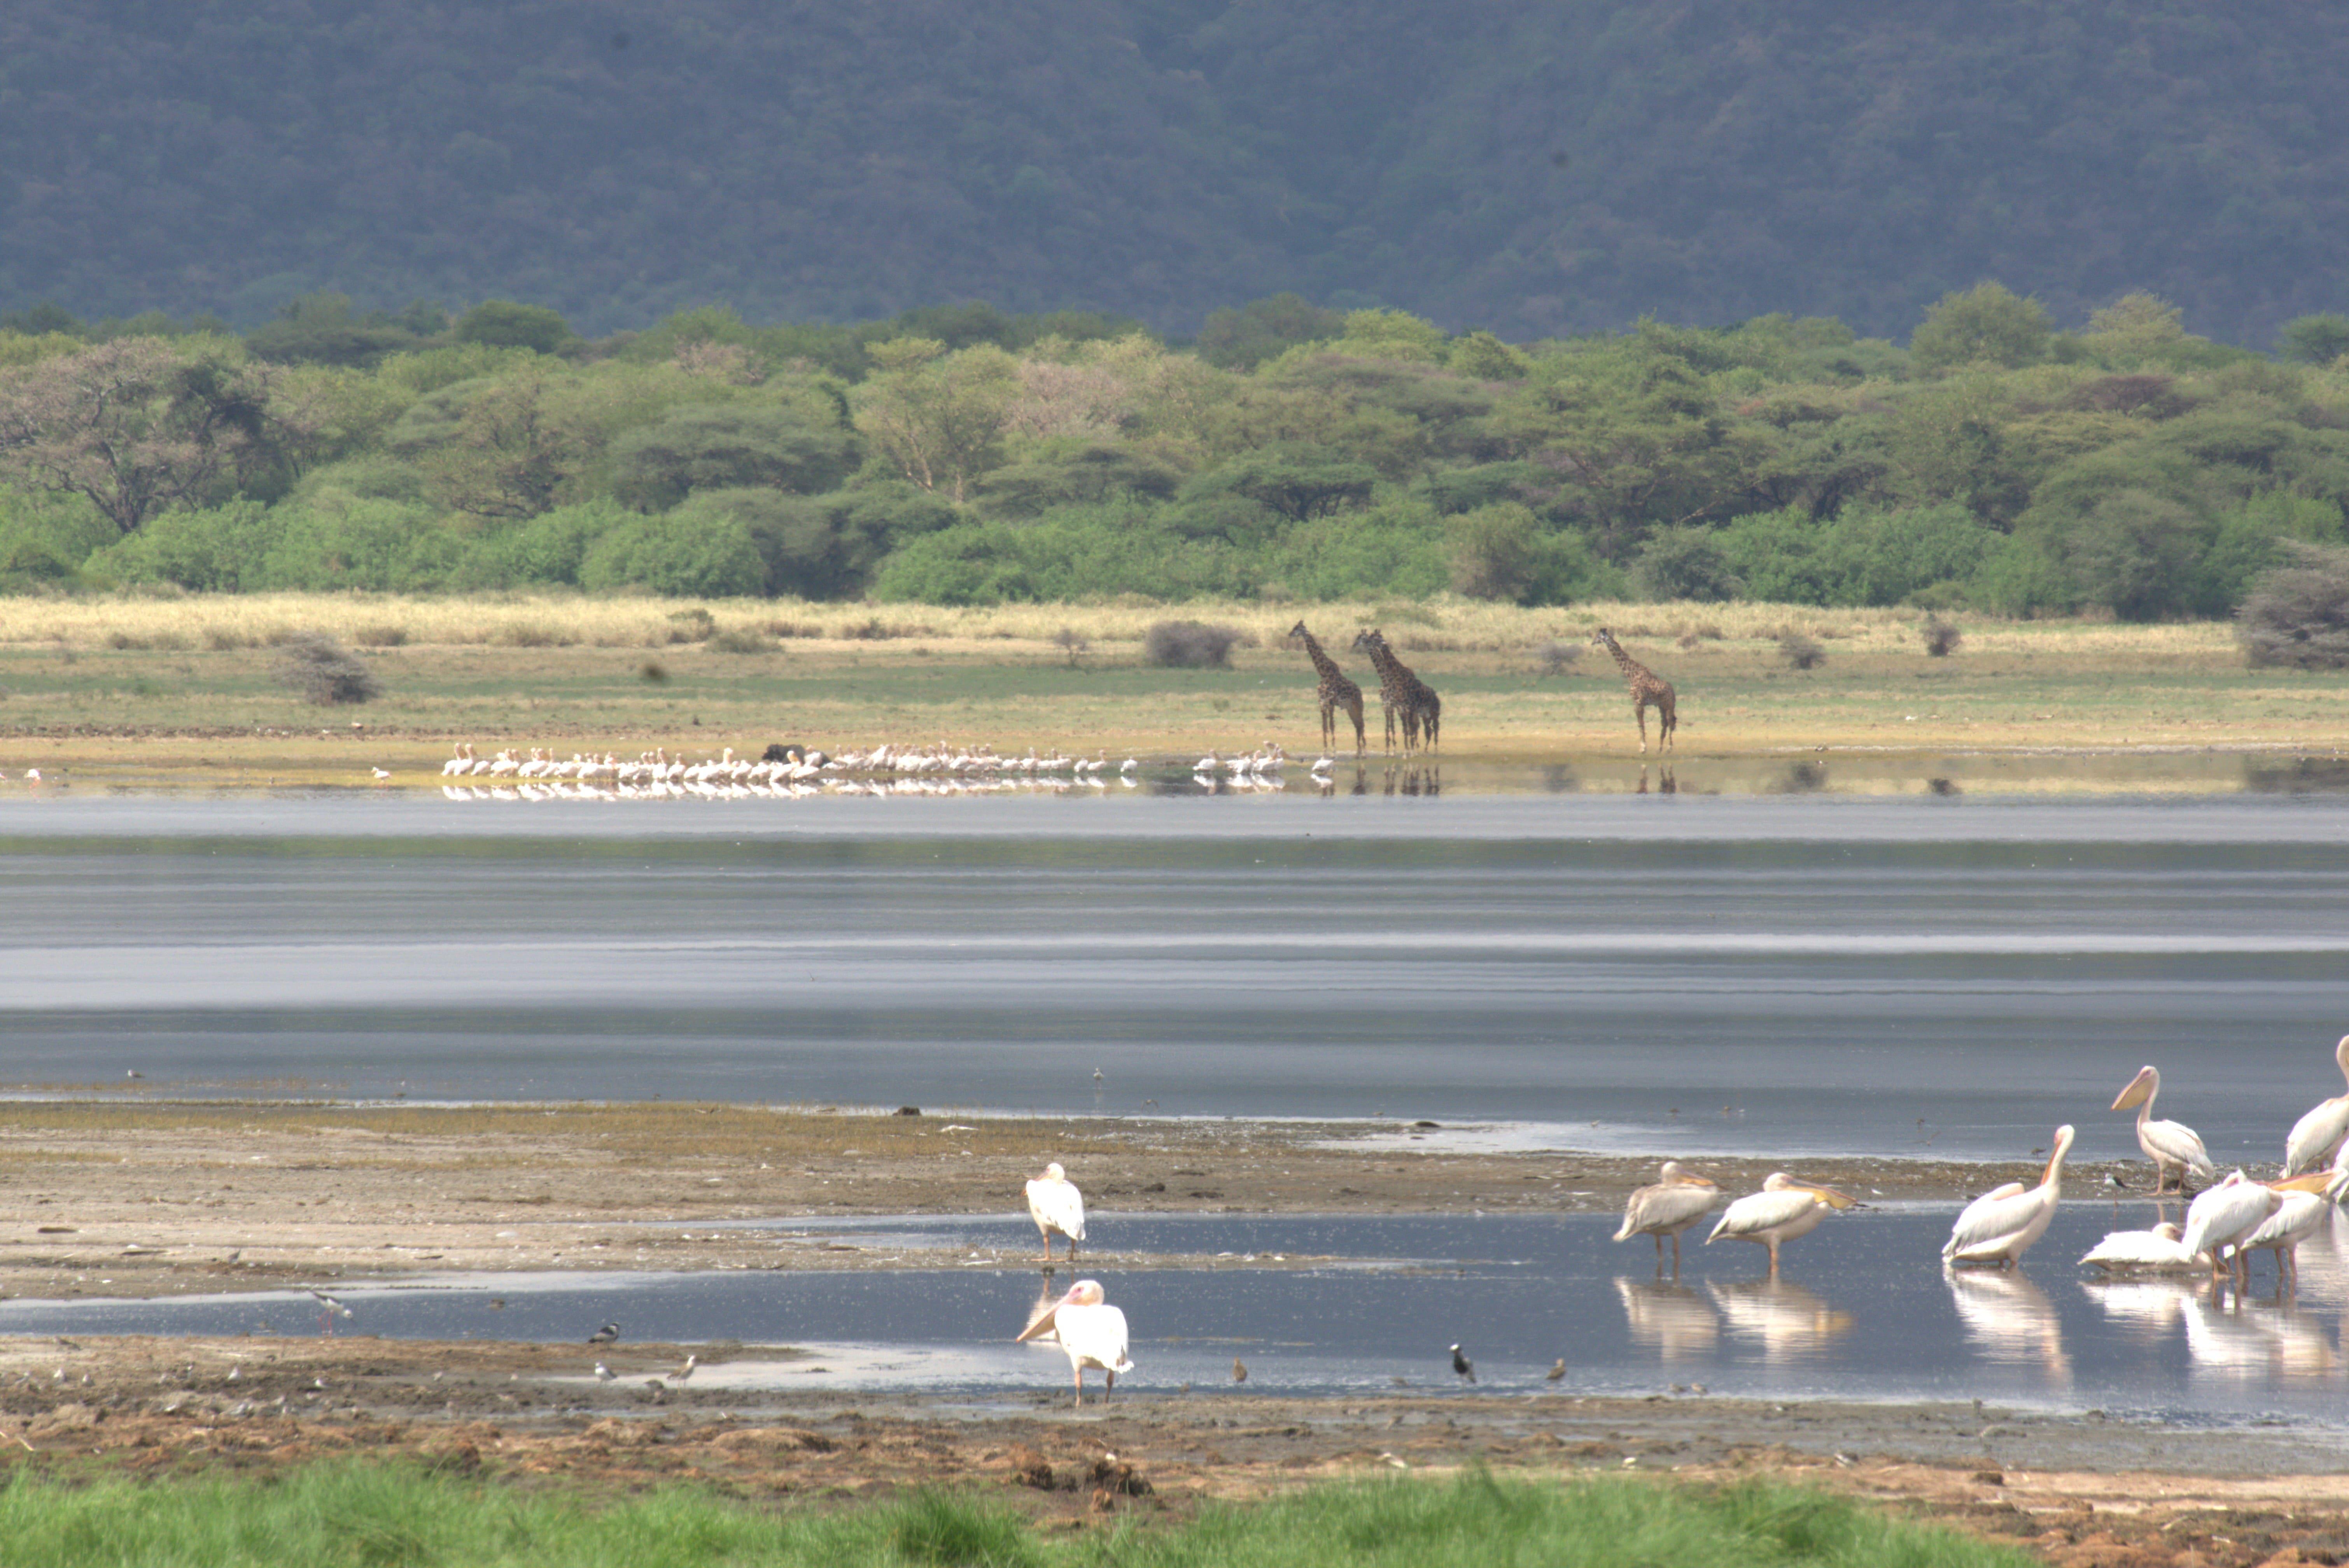 Lake Manyara NP, Tanzania. Picture: Anne-Julie Rochette